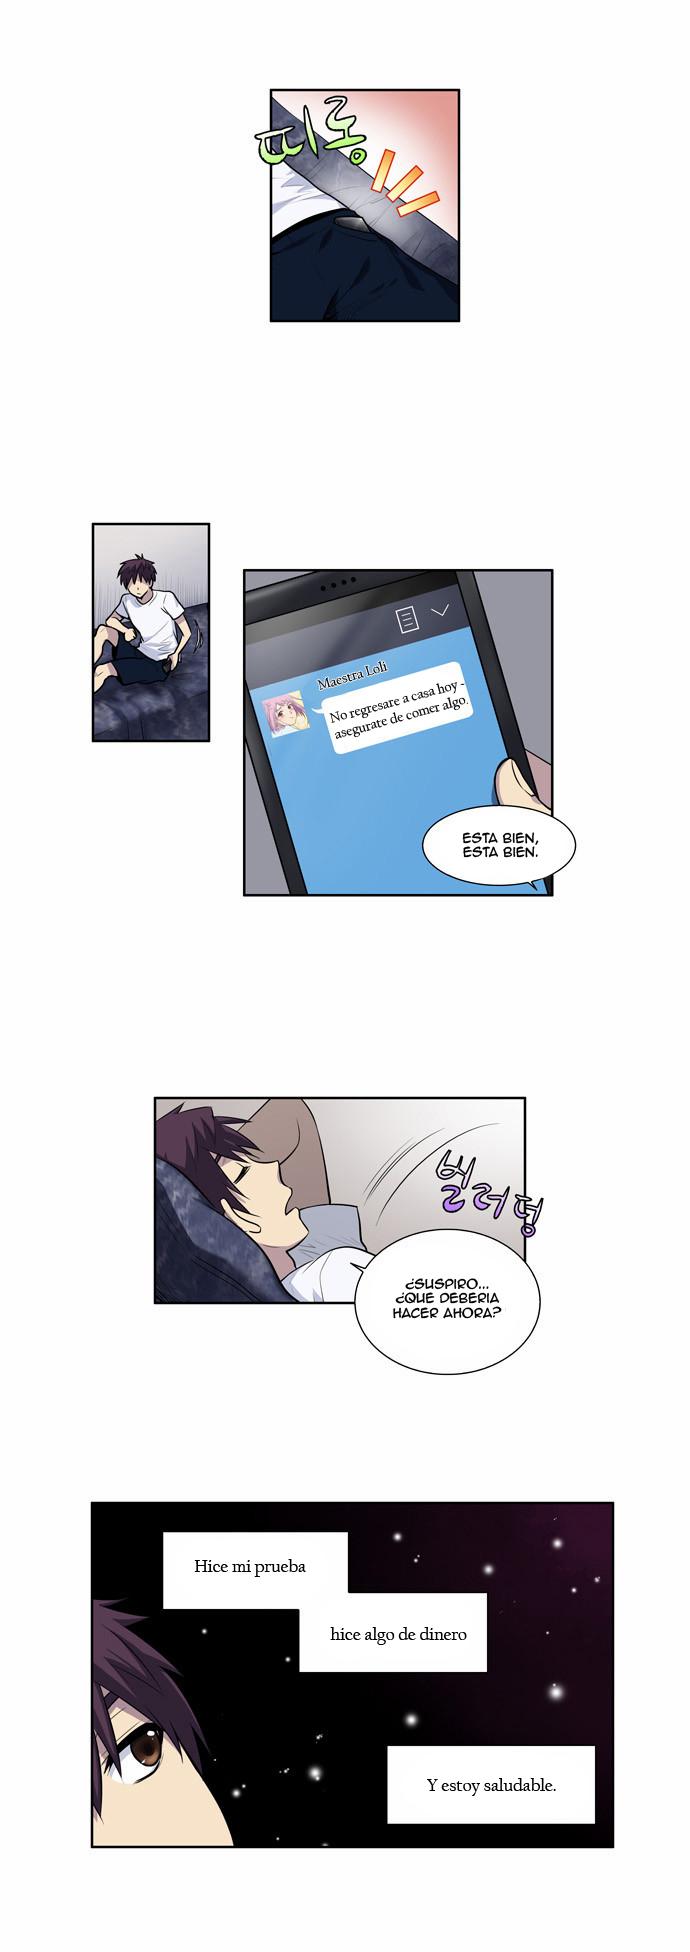 https://c5.ninemanga.com/es_manga/61/1725/419329/e8f51c2698fbcced3bfe59f41b257292.jpg Page 4